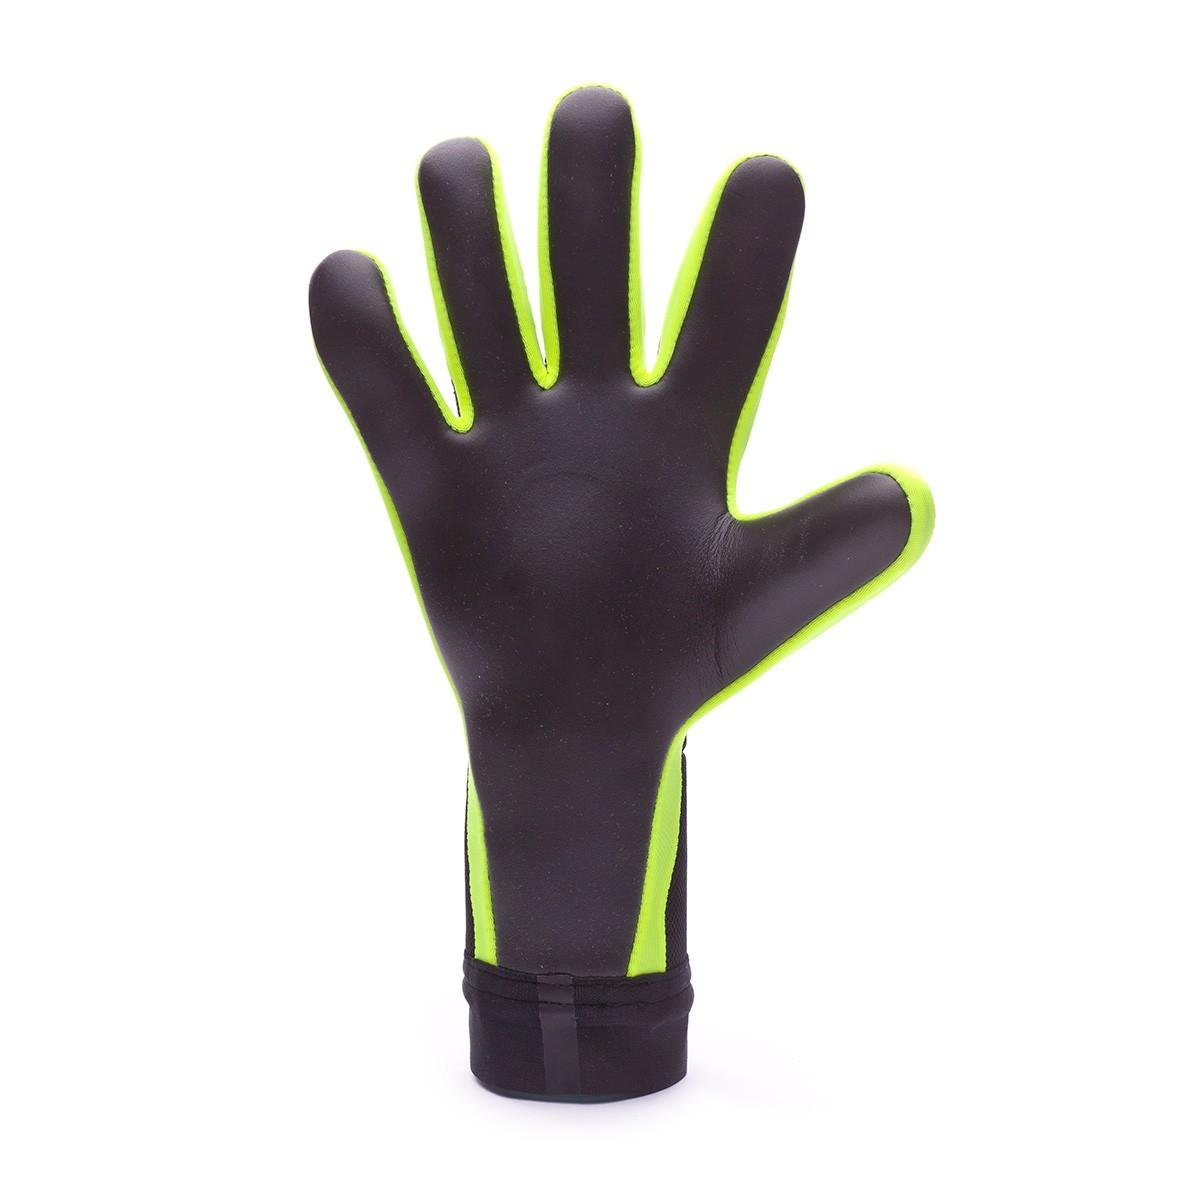 5f12442d309 Glove Nike Mercurial Touch Elite Promo Black-Volt - Football store Fútbol  Emotion